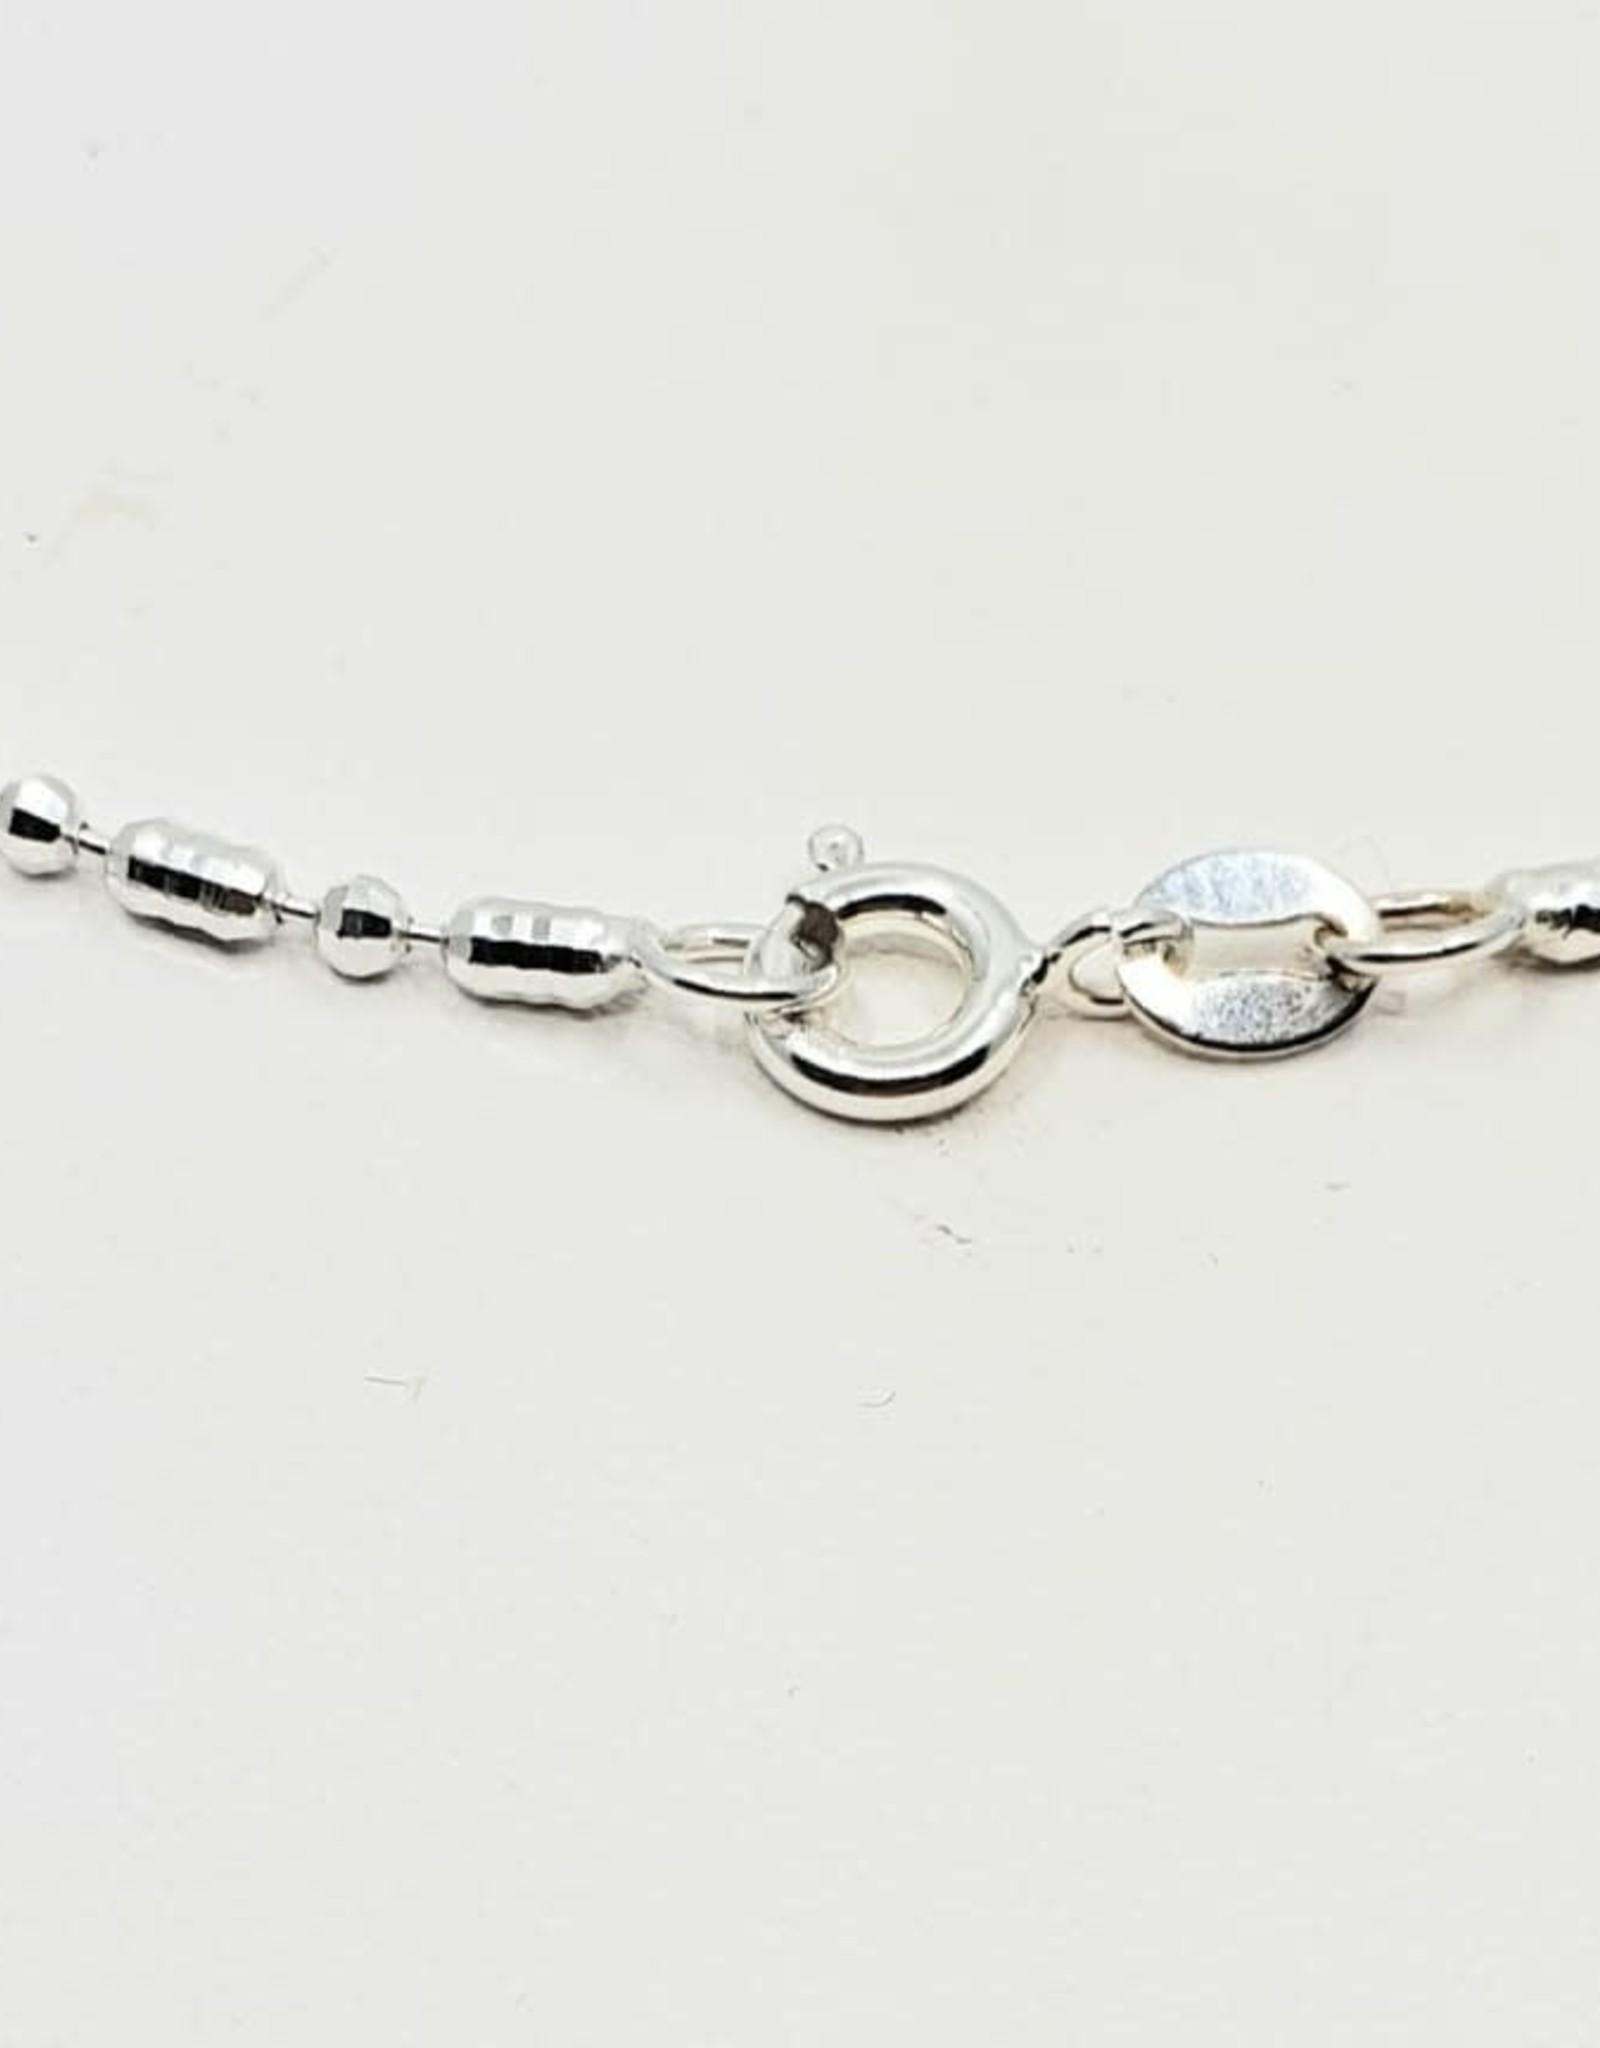 "silver chain 16"" bath tub link"